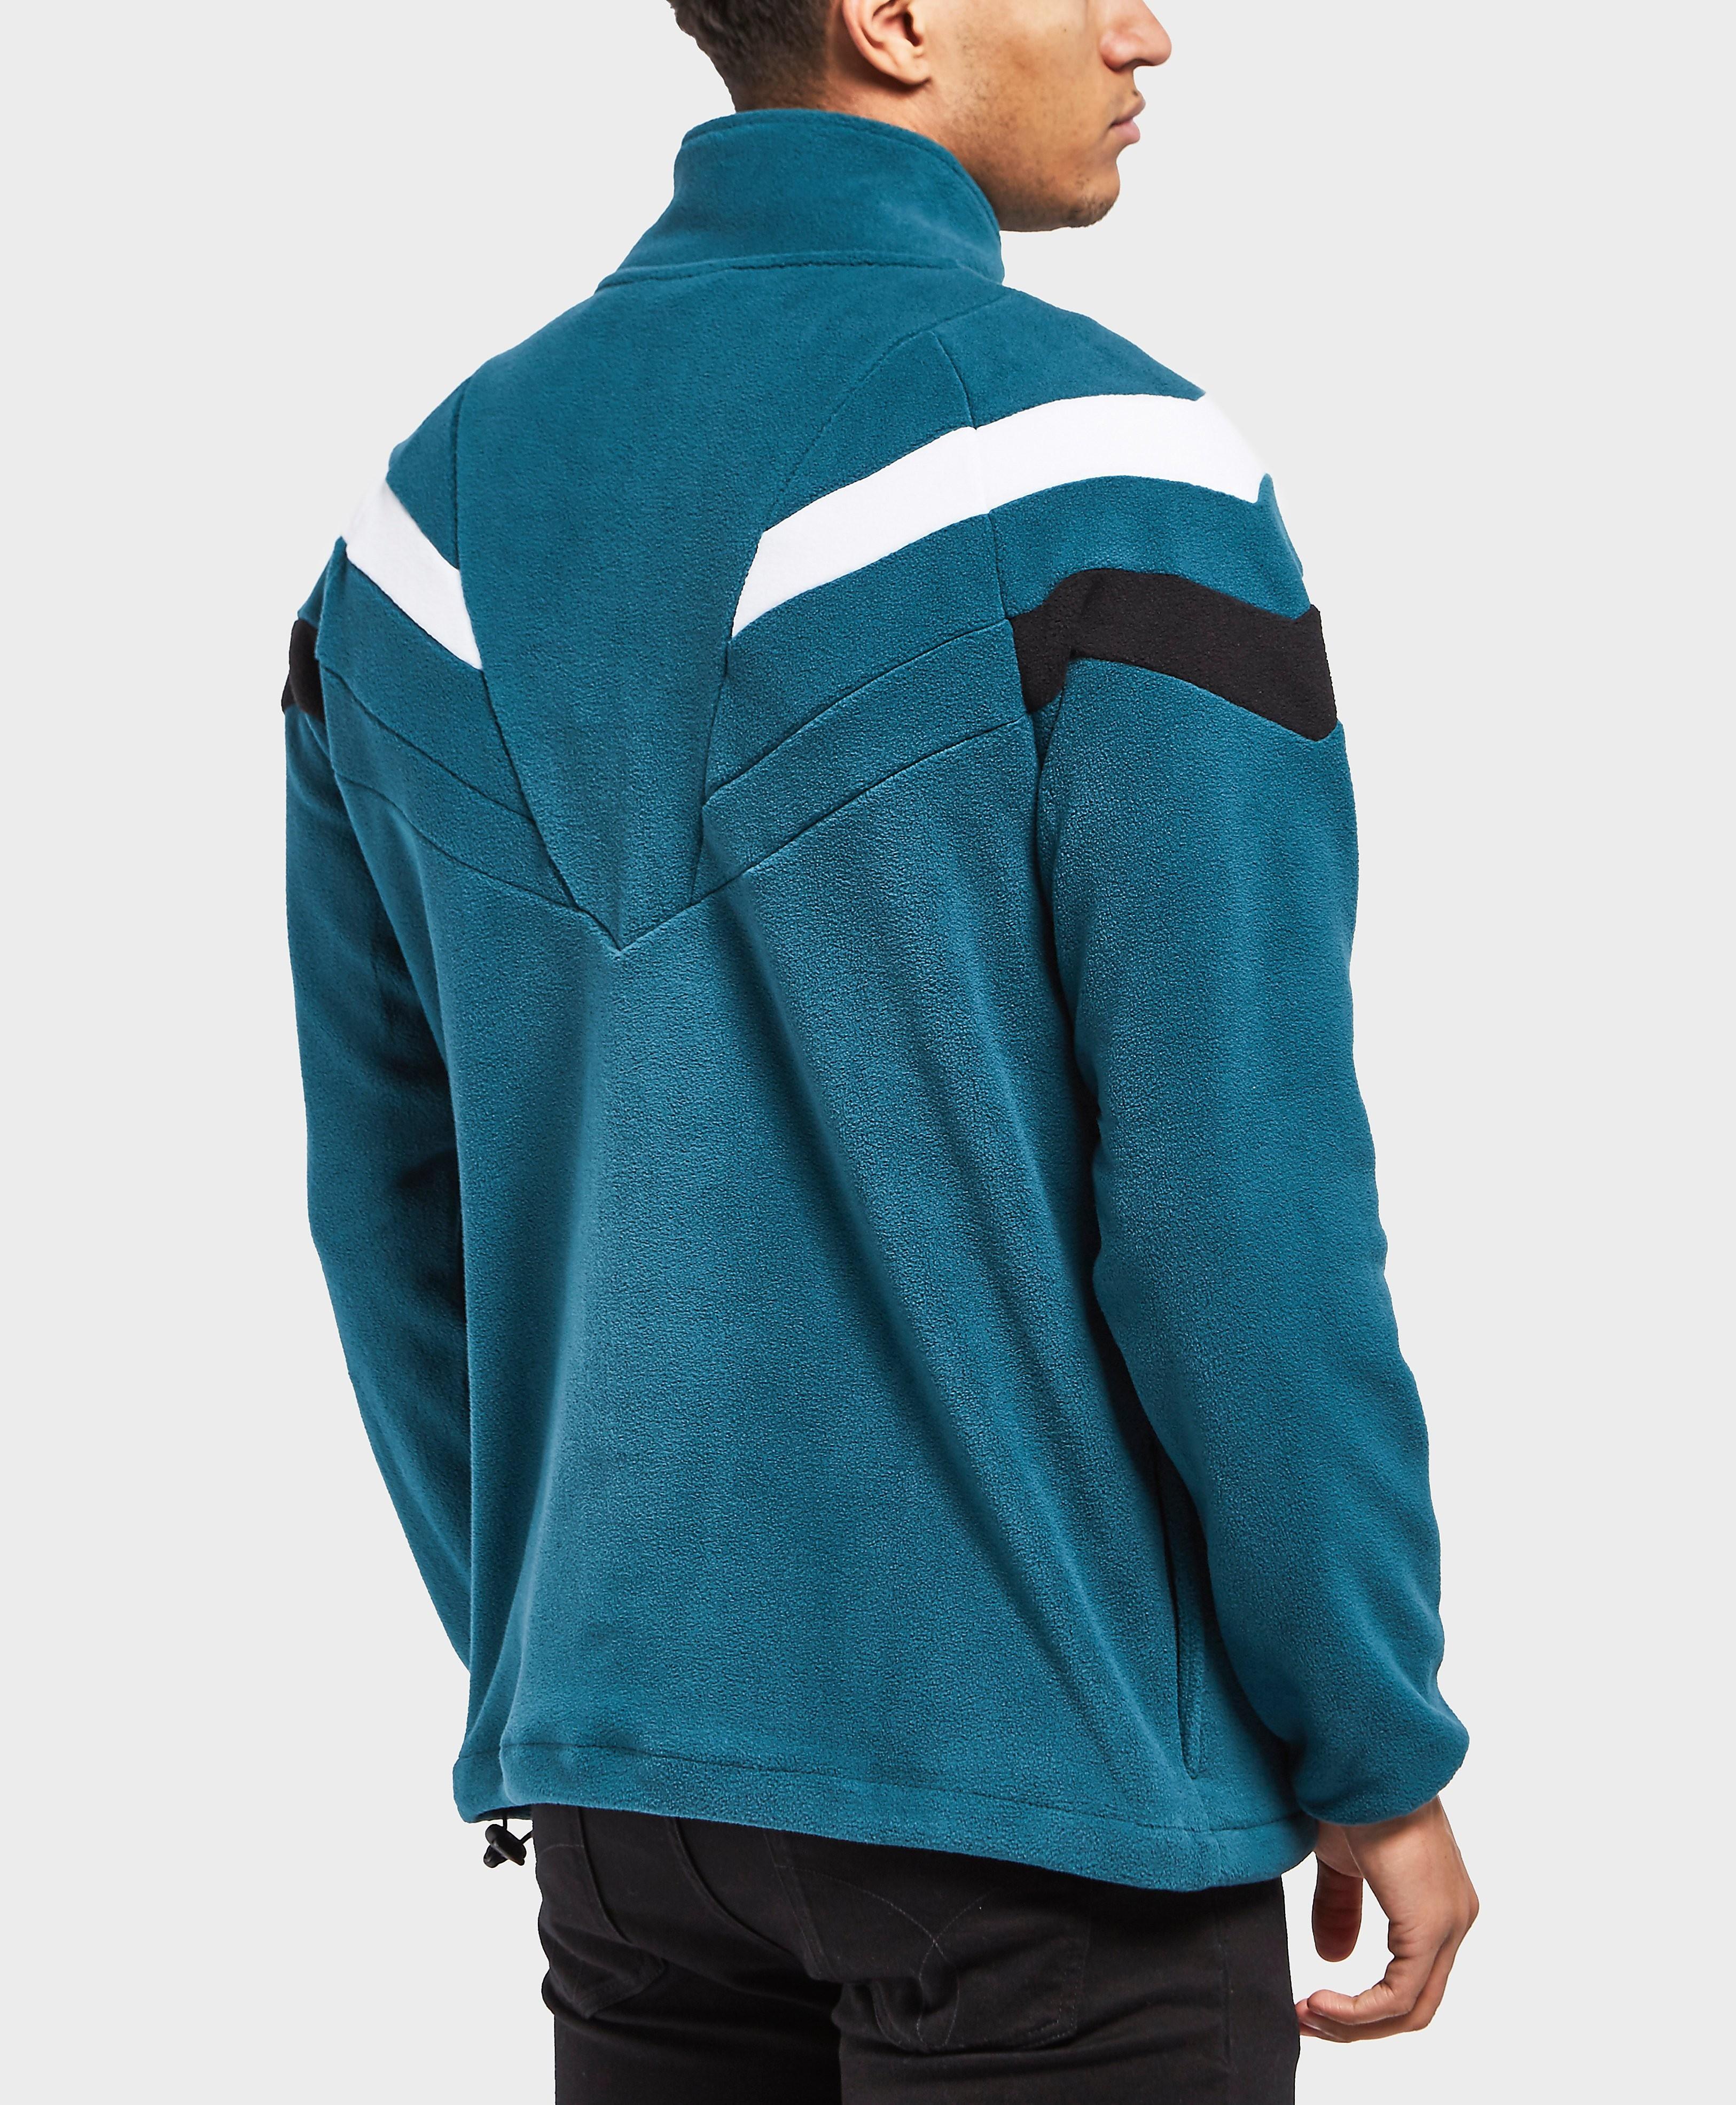 Fila Val Veny 1/2 Zip Sweatshirt